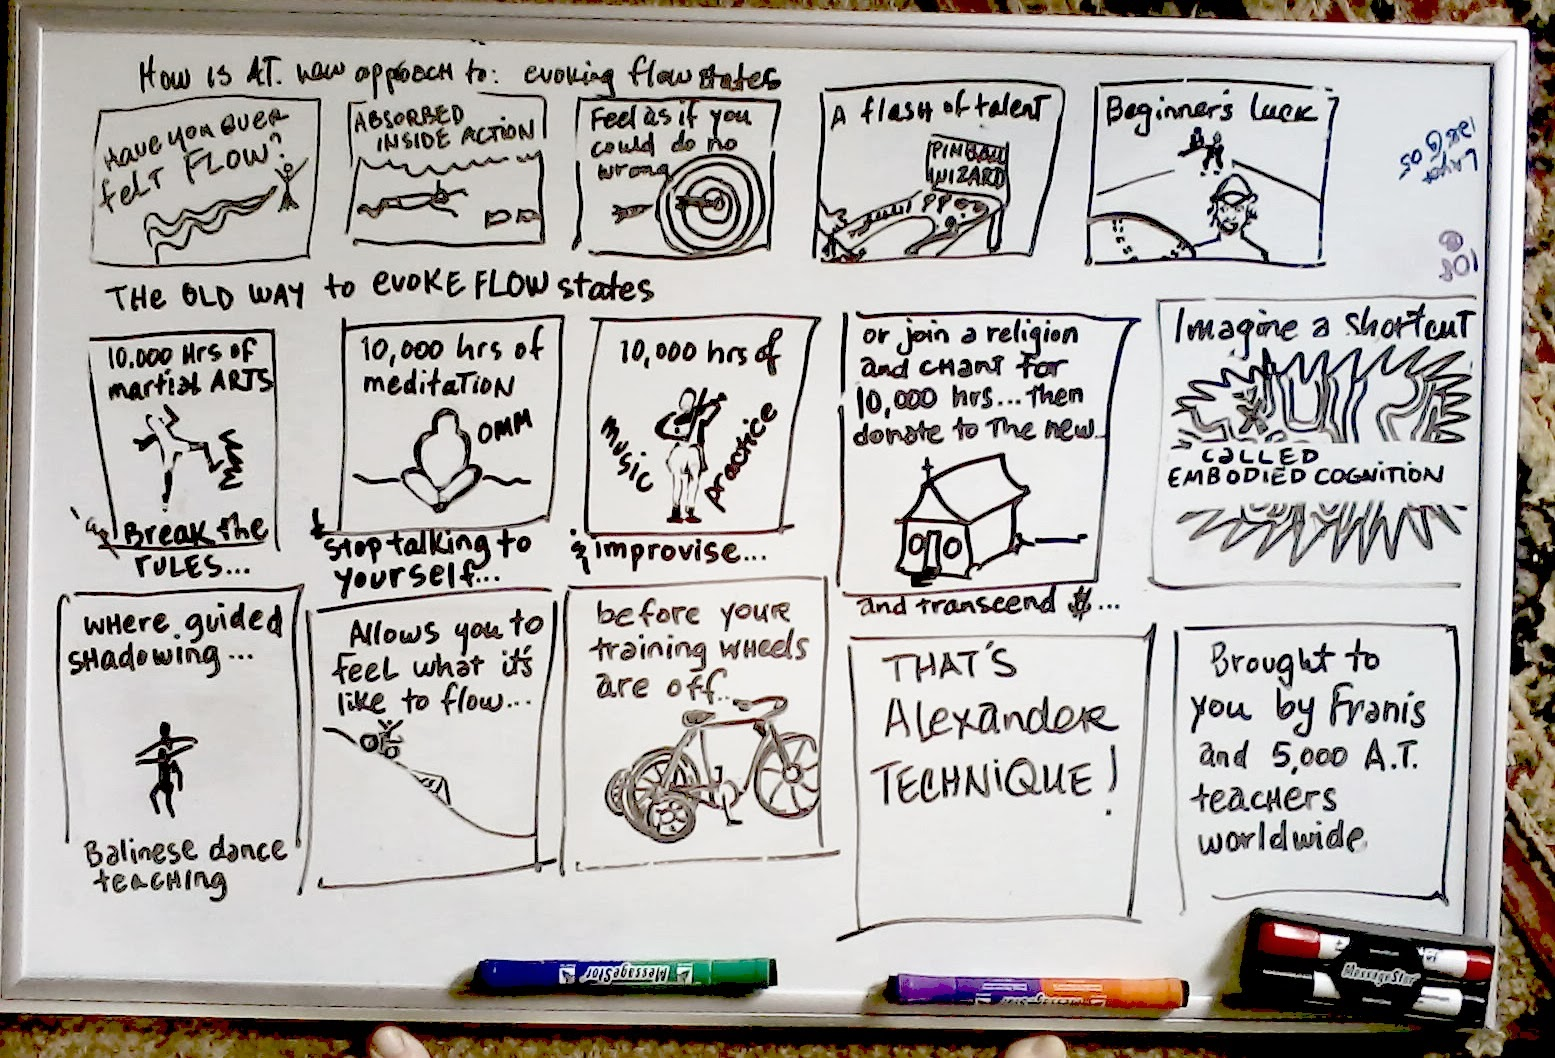 Franis Engel's Alexander Technique Story Board